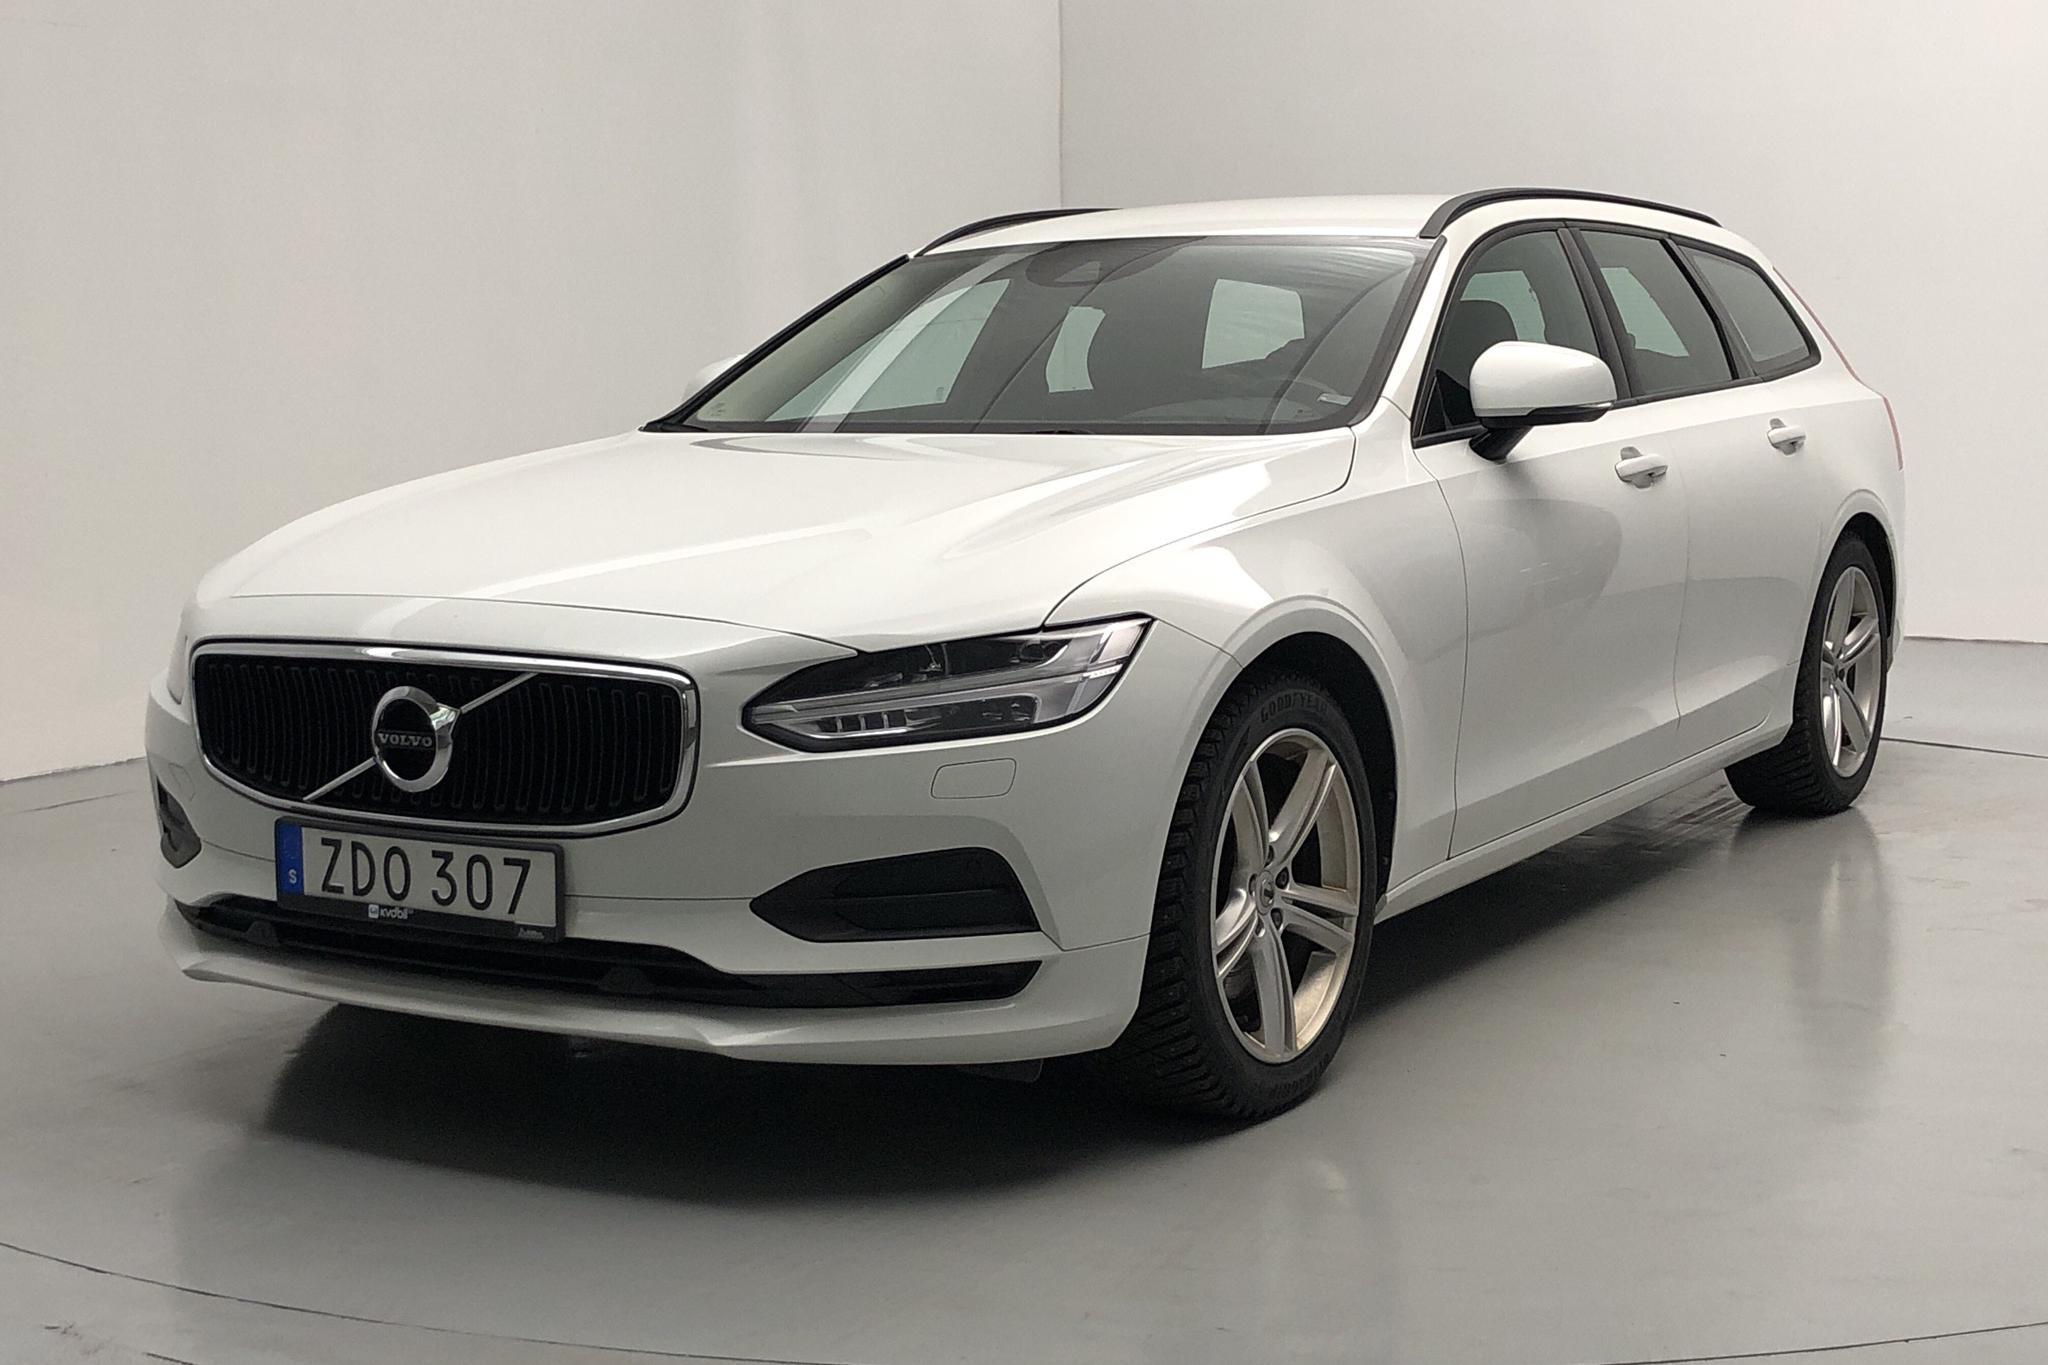 Volvo V90 T5 Bi-Fuel (254hk) - 151 660 km - Automatic - white - 2018